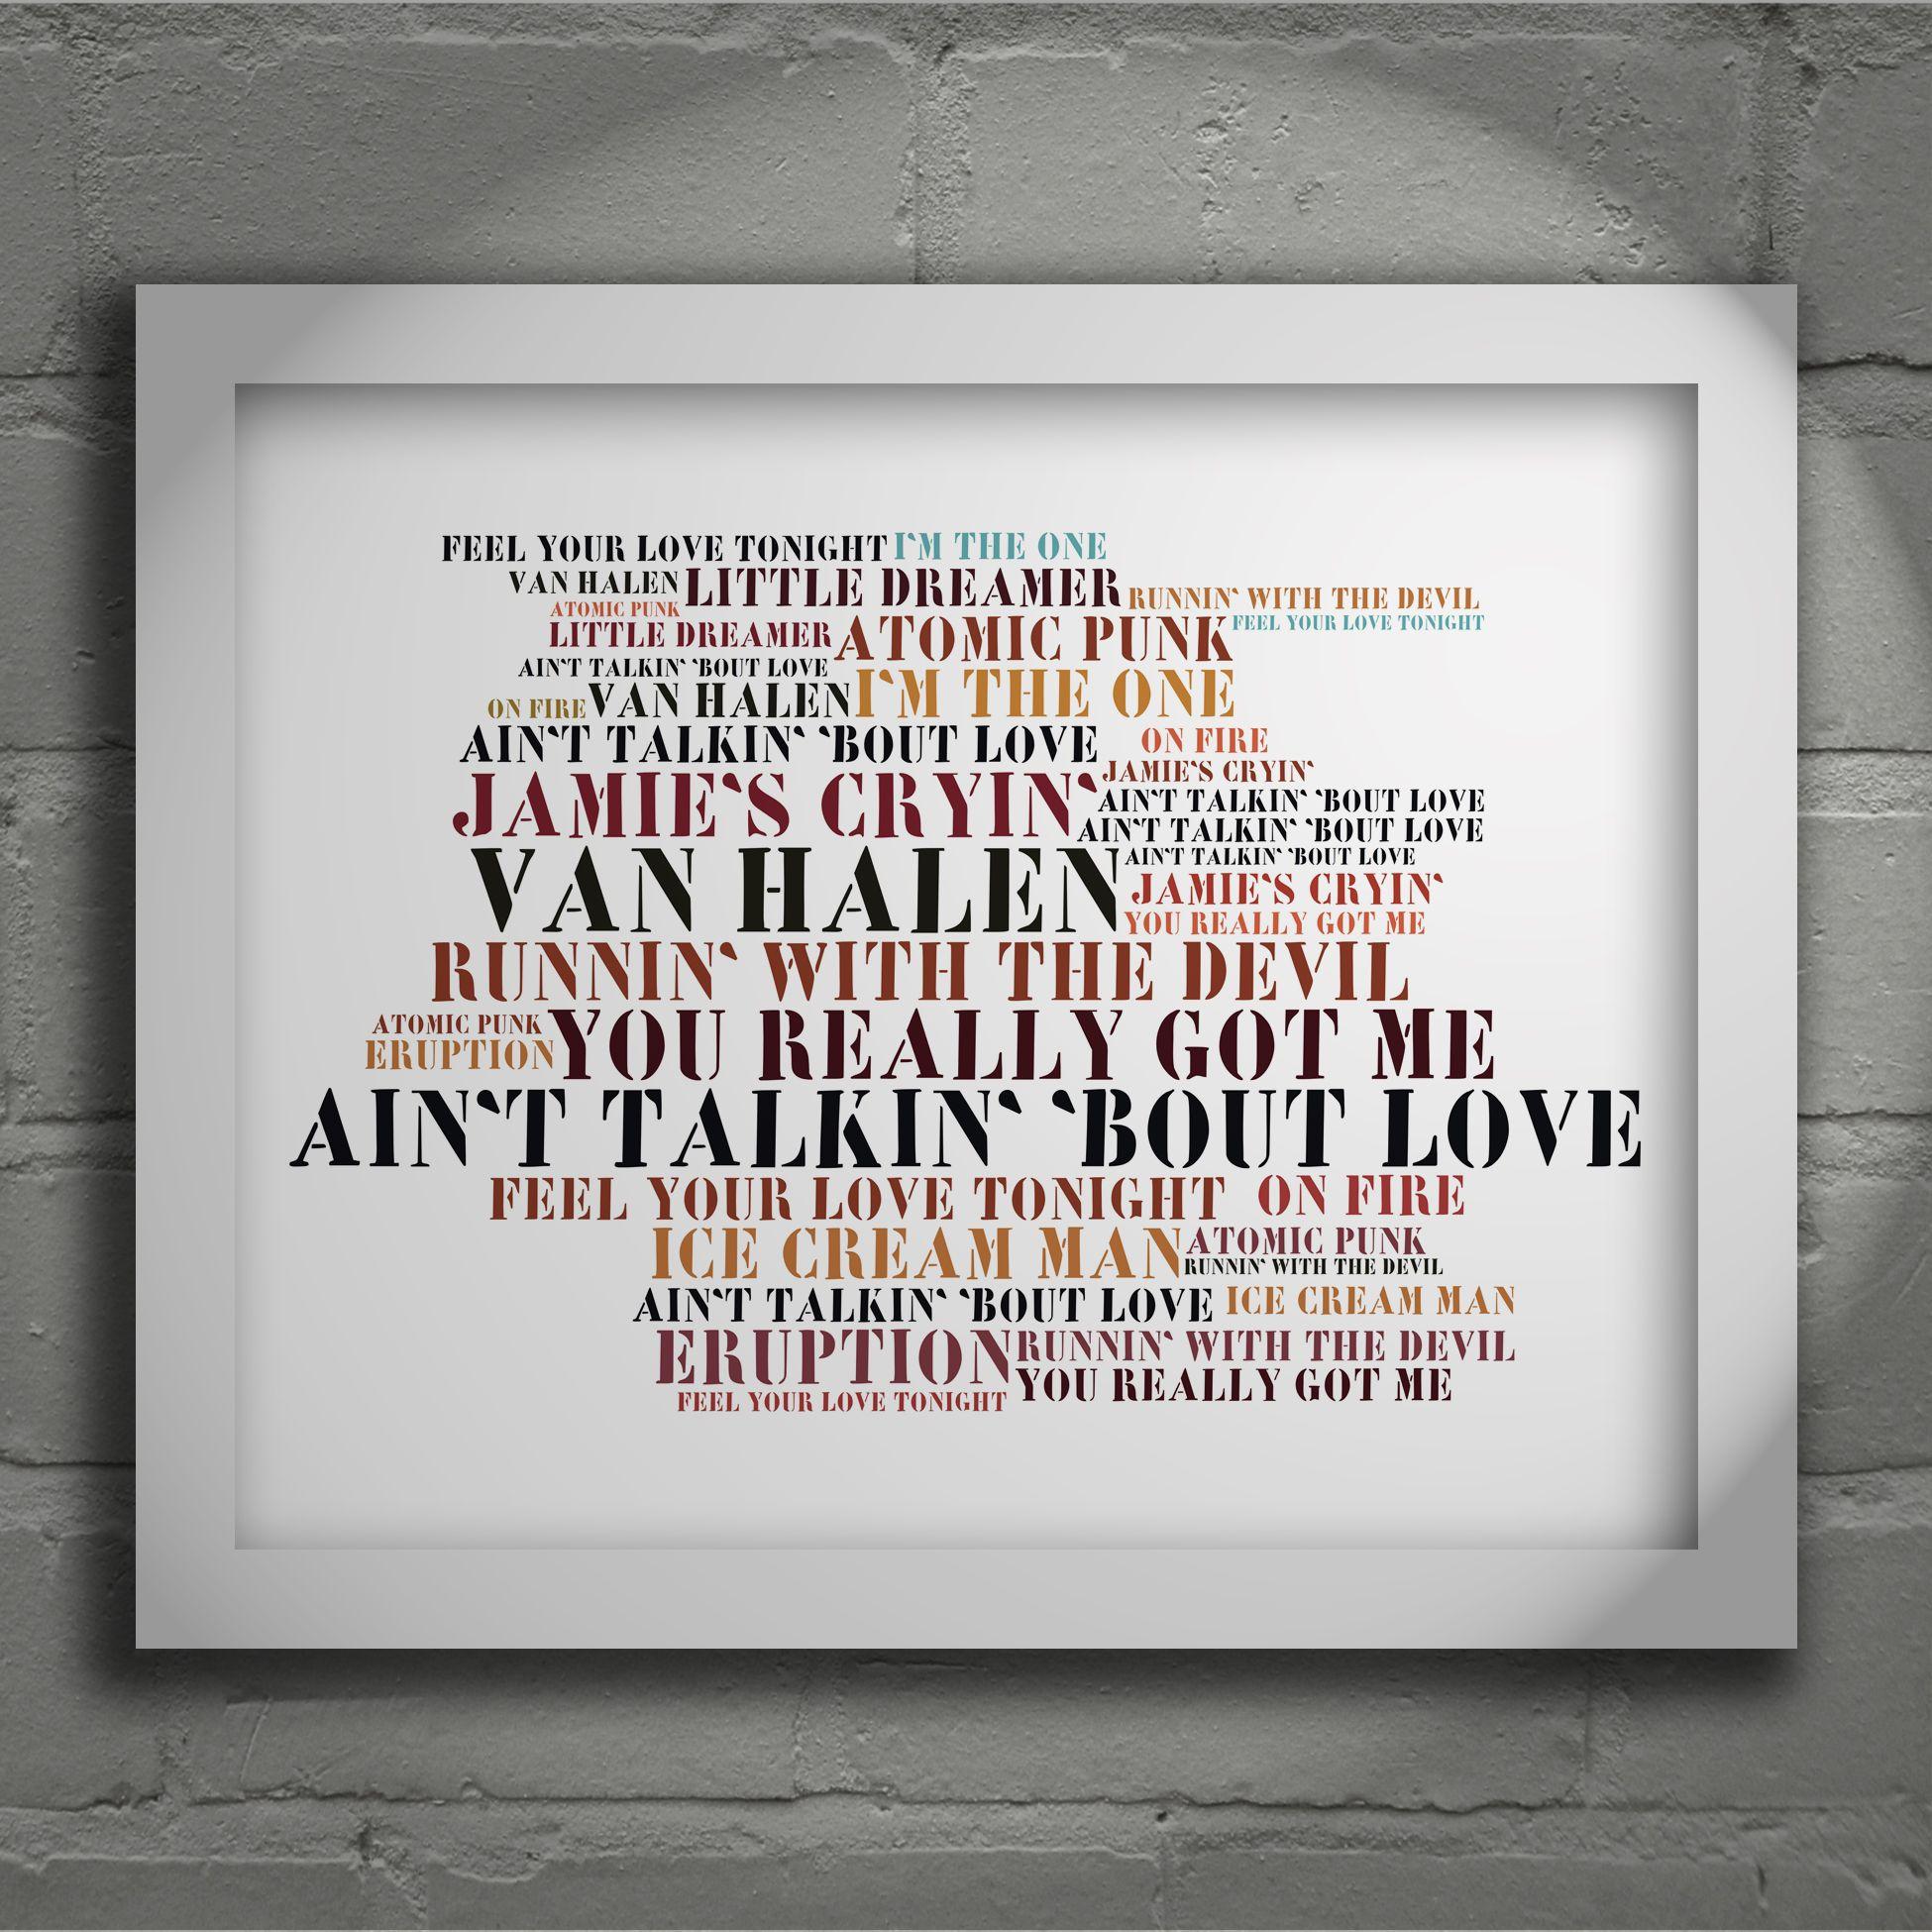 Van Halen Limited Edition Typography Lyrics Art Print Signed And Numbered Album Wall Art Poster Available From Lyrics Art Typography Art Print Poster Wall Art